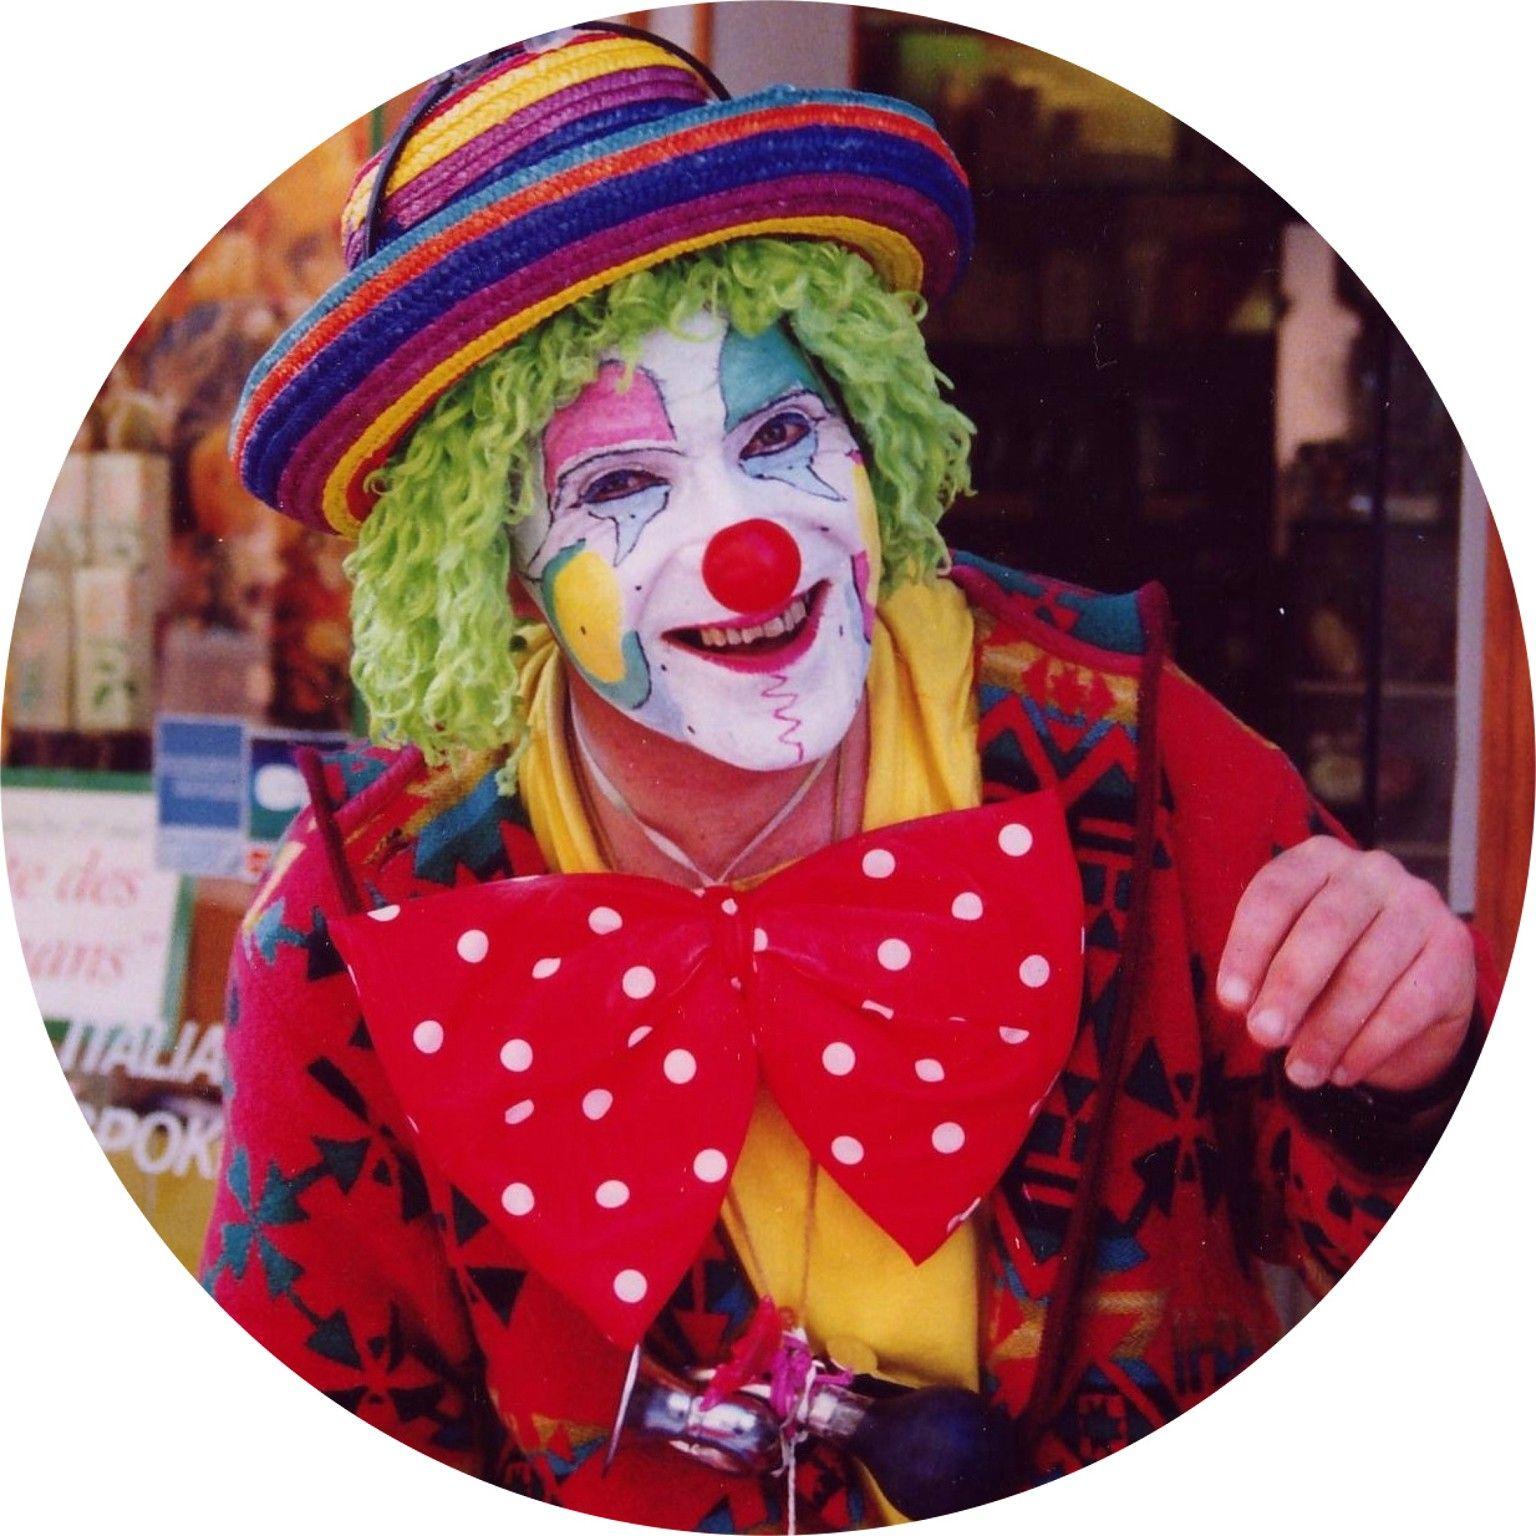 happy clown faces pictures - HD1536×1536